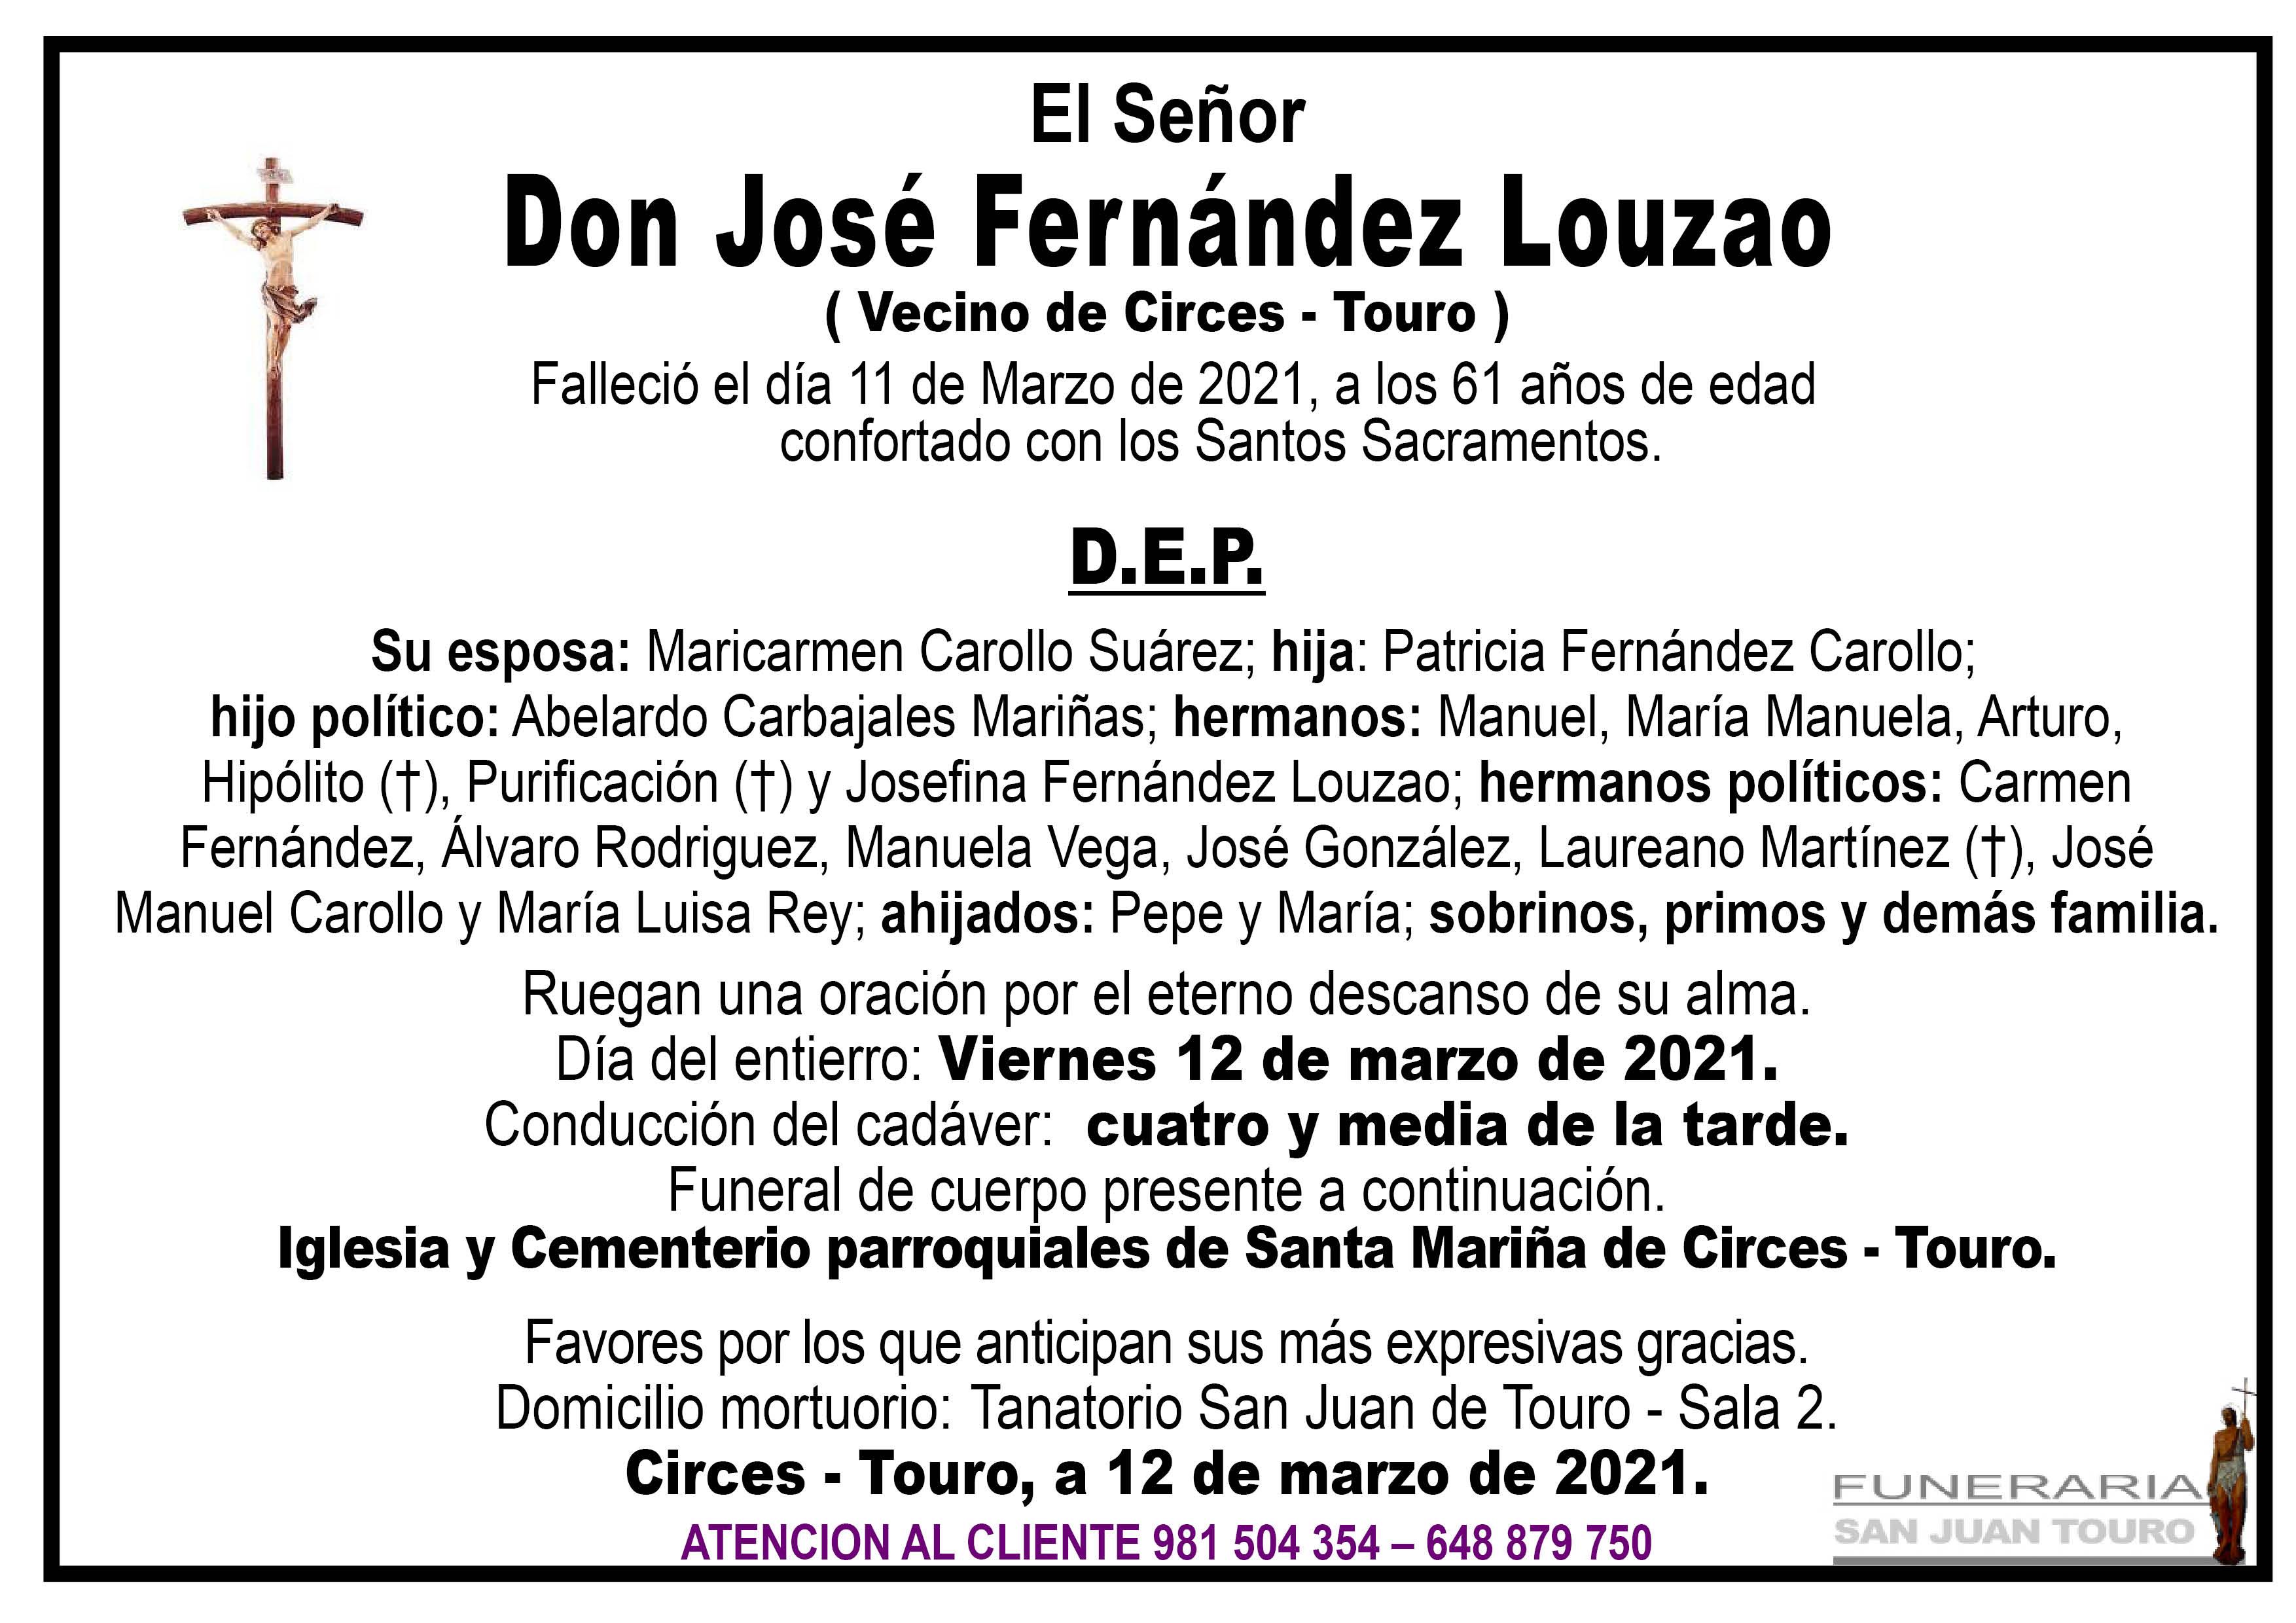 Esquela de SEPELIO DE DON JOSÉ FERNÁNDEZ LOUZAO